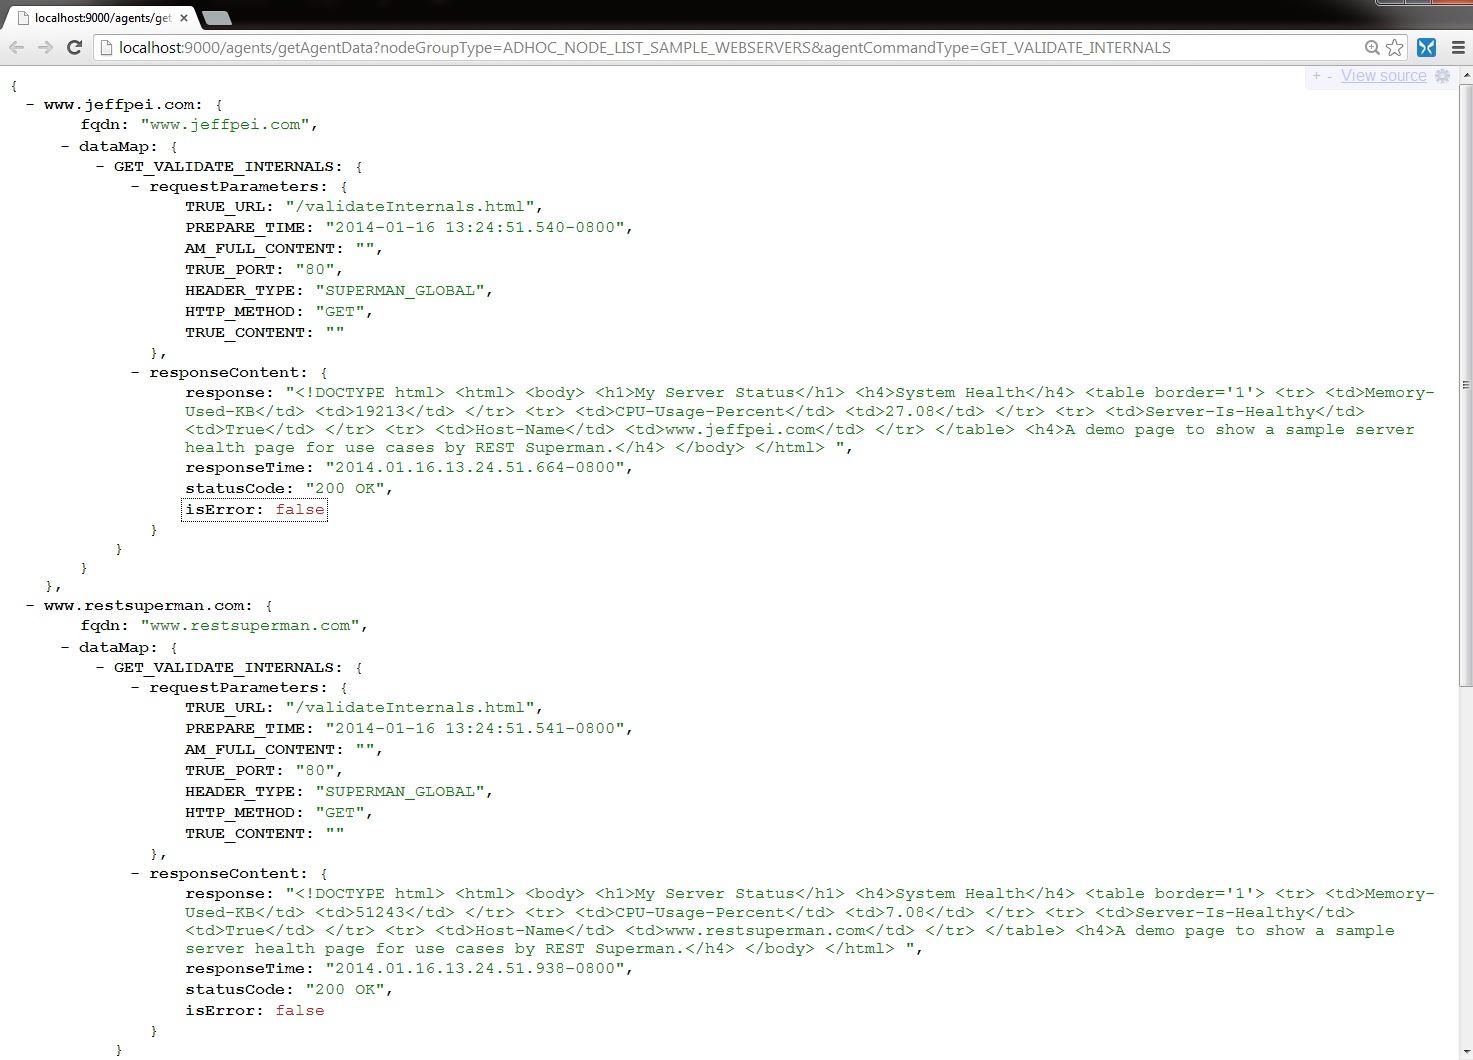 REST Commander - Parallel Async HTTP Client as a Service, Speaks